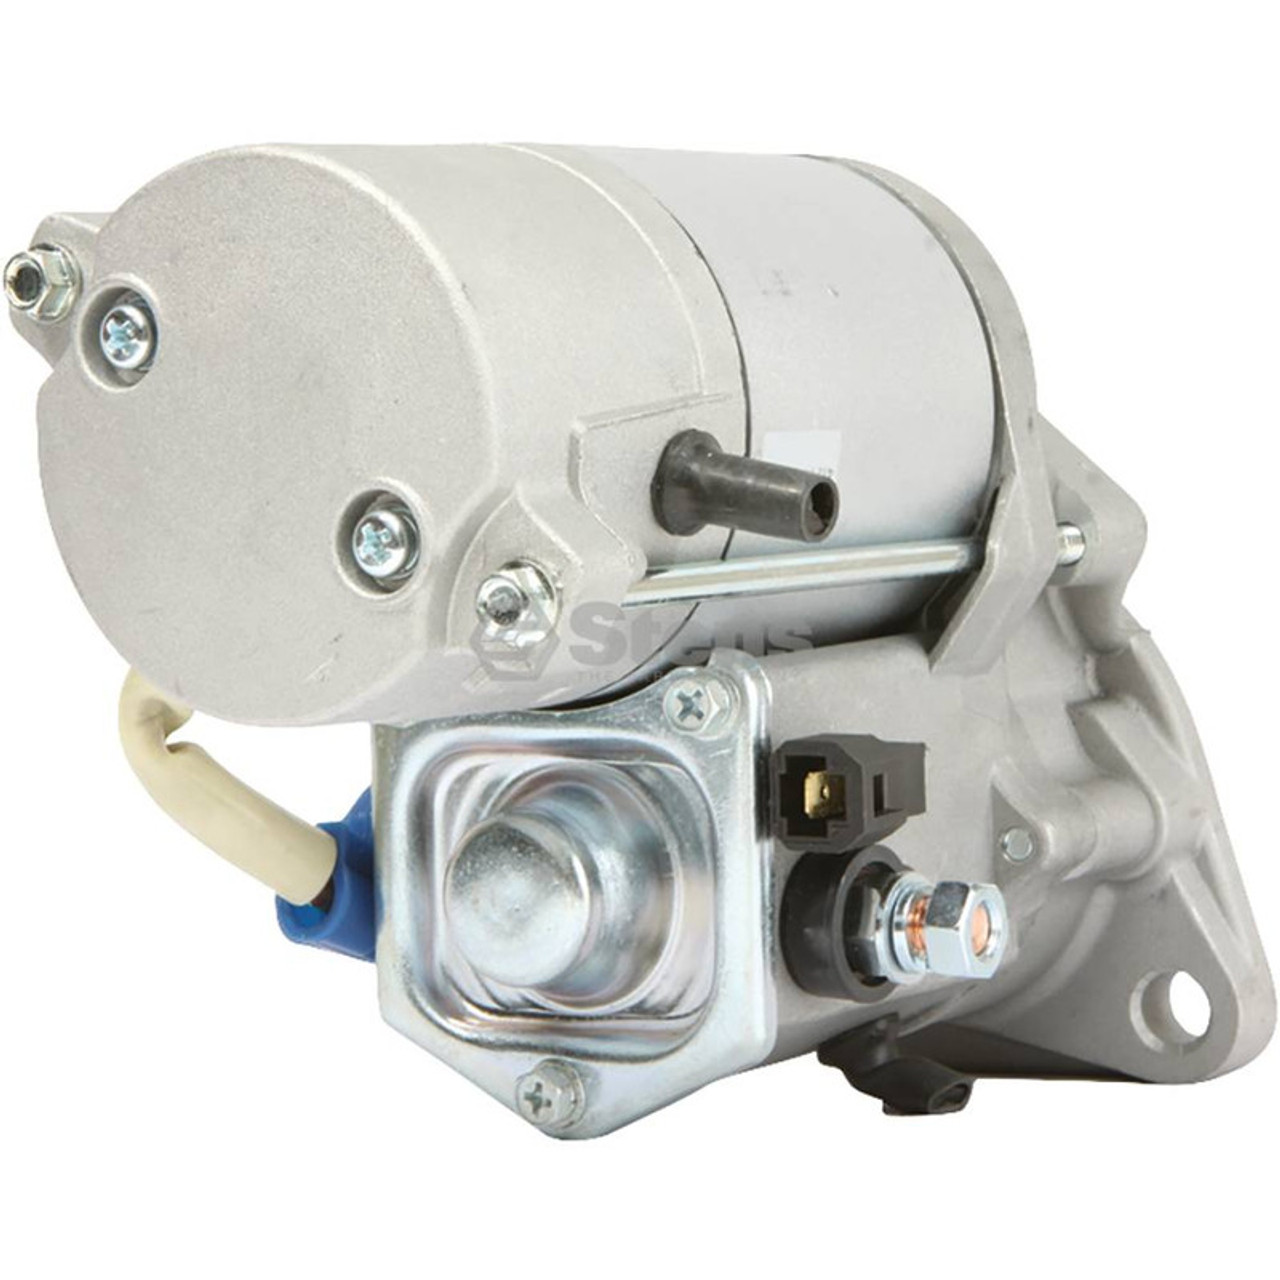 Electric Starter for Kubota KX1213, KX1213R3, KX1213R4, KX1213R4A, KX1213S,KX1213S3, KX1213S4, KX1213S4A, KX1213ST, KX1613, KX1613R1, KX1613R2, KX1613S, KX1613ST, KX1613S1, KX1613S2, L3430HSTC, L4330HSTC, L4740, L4740GST, L4740GST3, L4740HST, 1712363013, 1712363016, 1G91163012, 17123-63013, 17123-63016, 1G911-63012